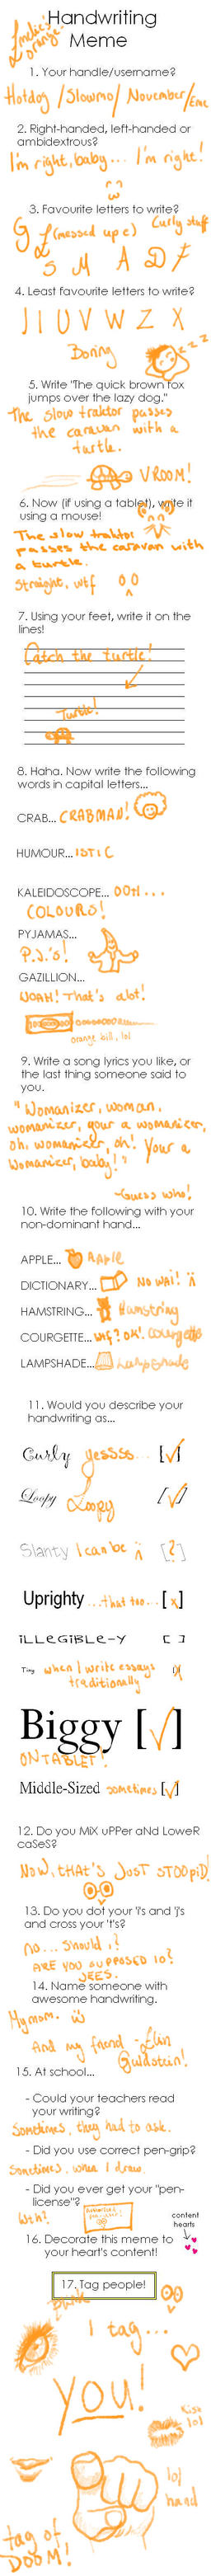 Handwriting Meme by XNovember